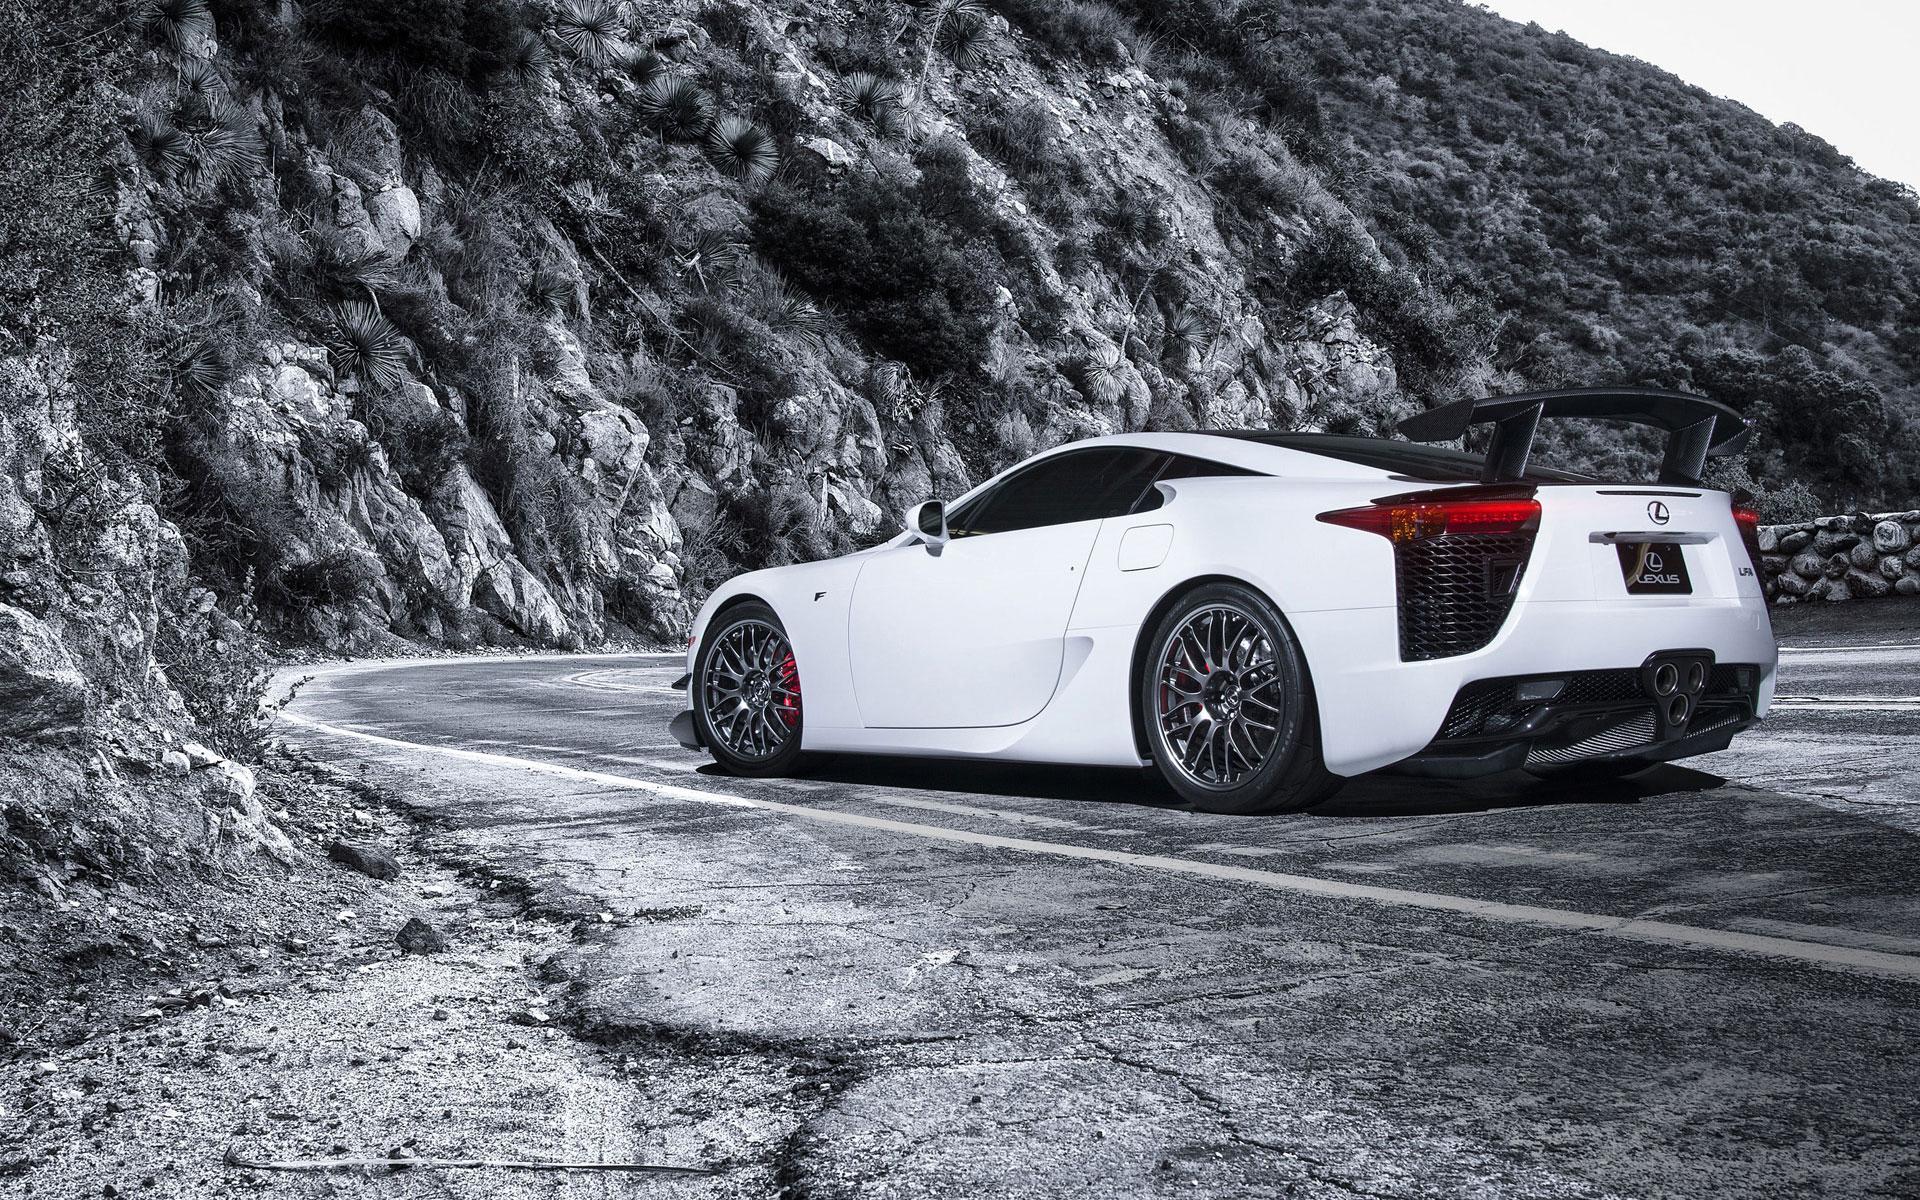 Toyota Lexus LFA white color wallpaper